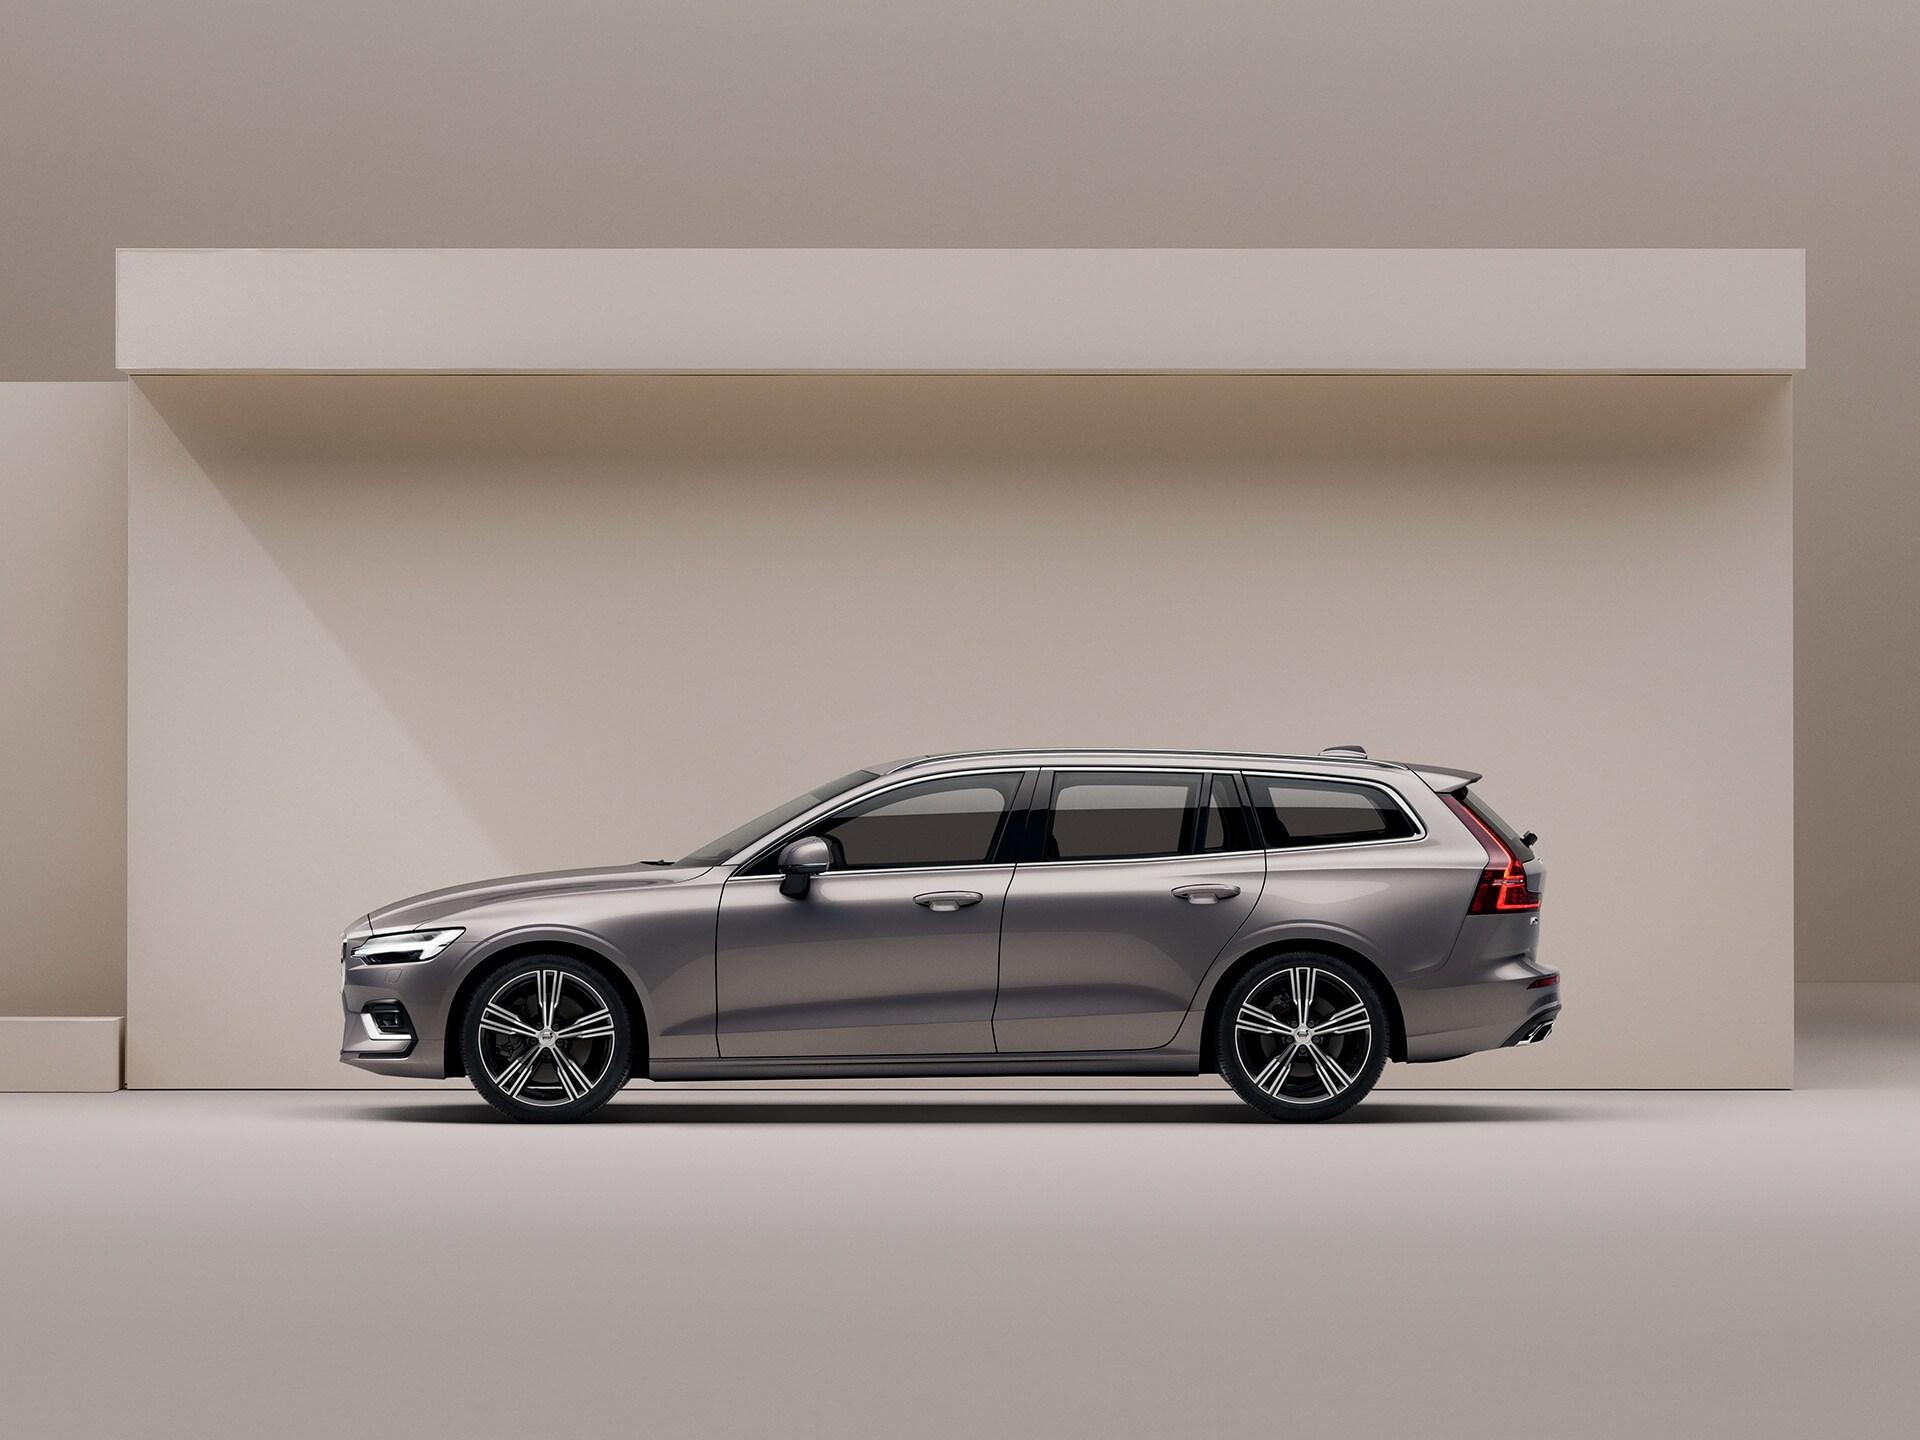 A beige Volvo V60 in beige surroundings.